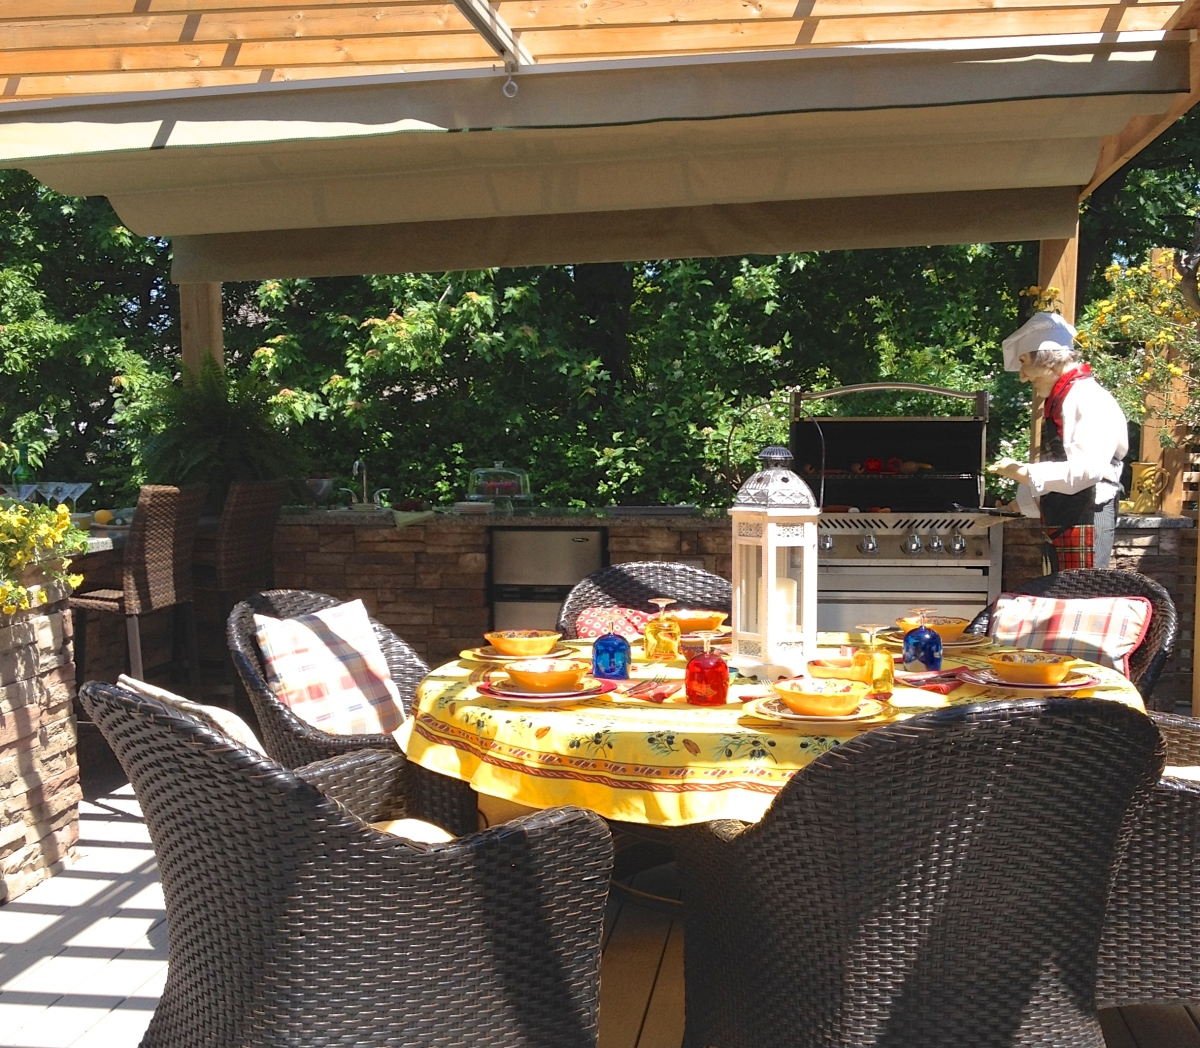 An outdoor kitchen under a pergola.